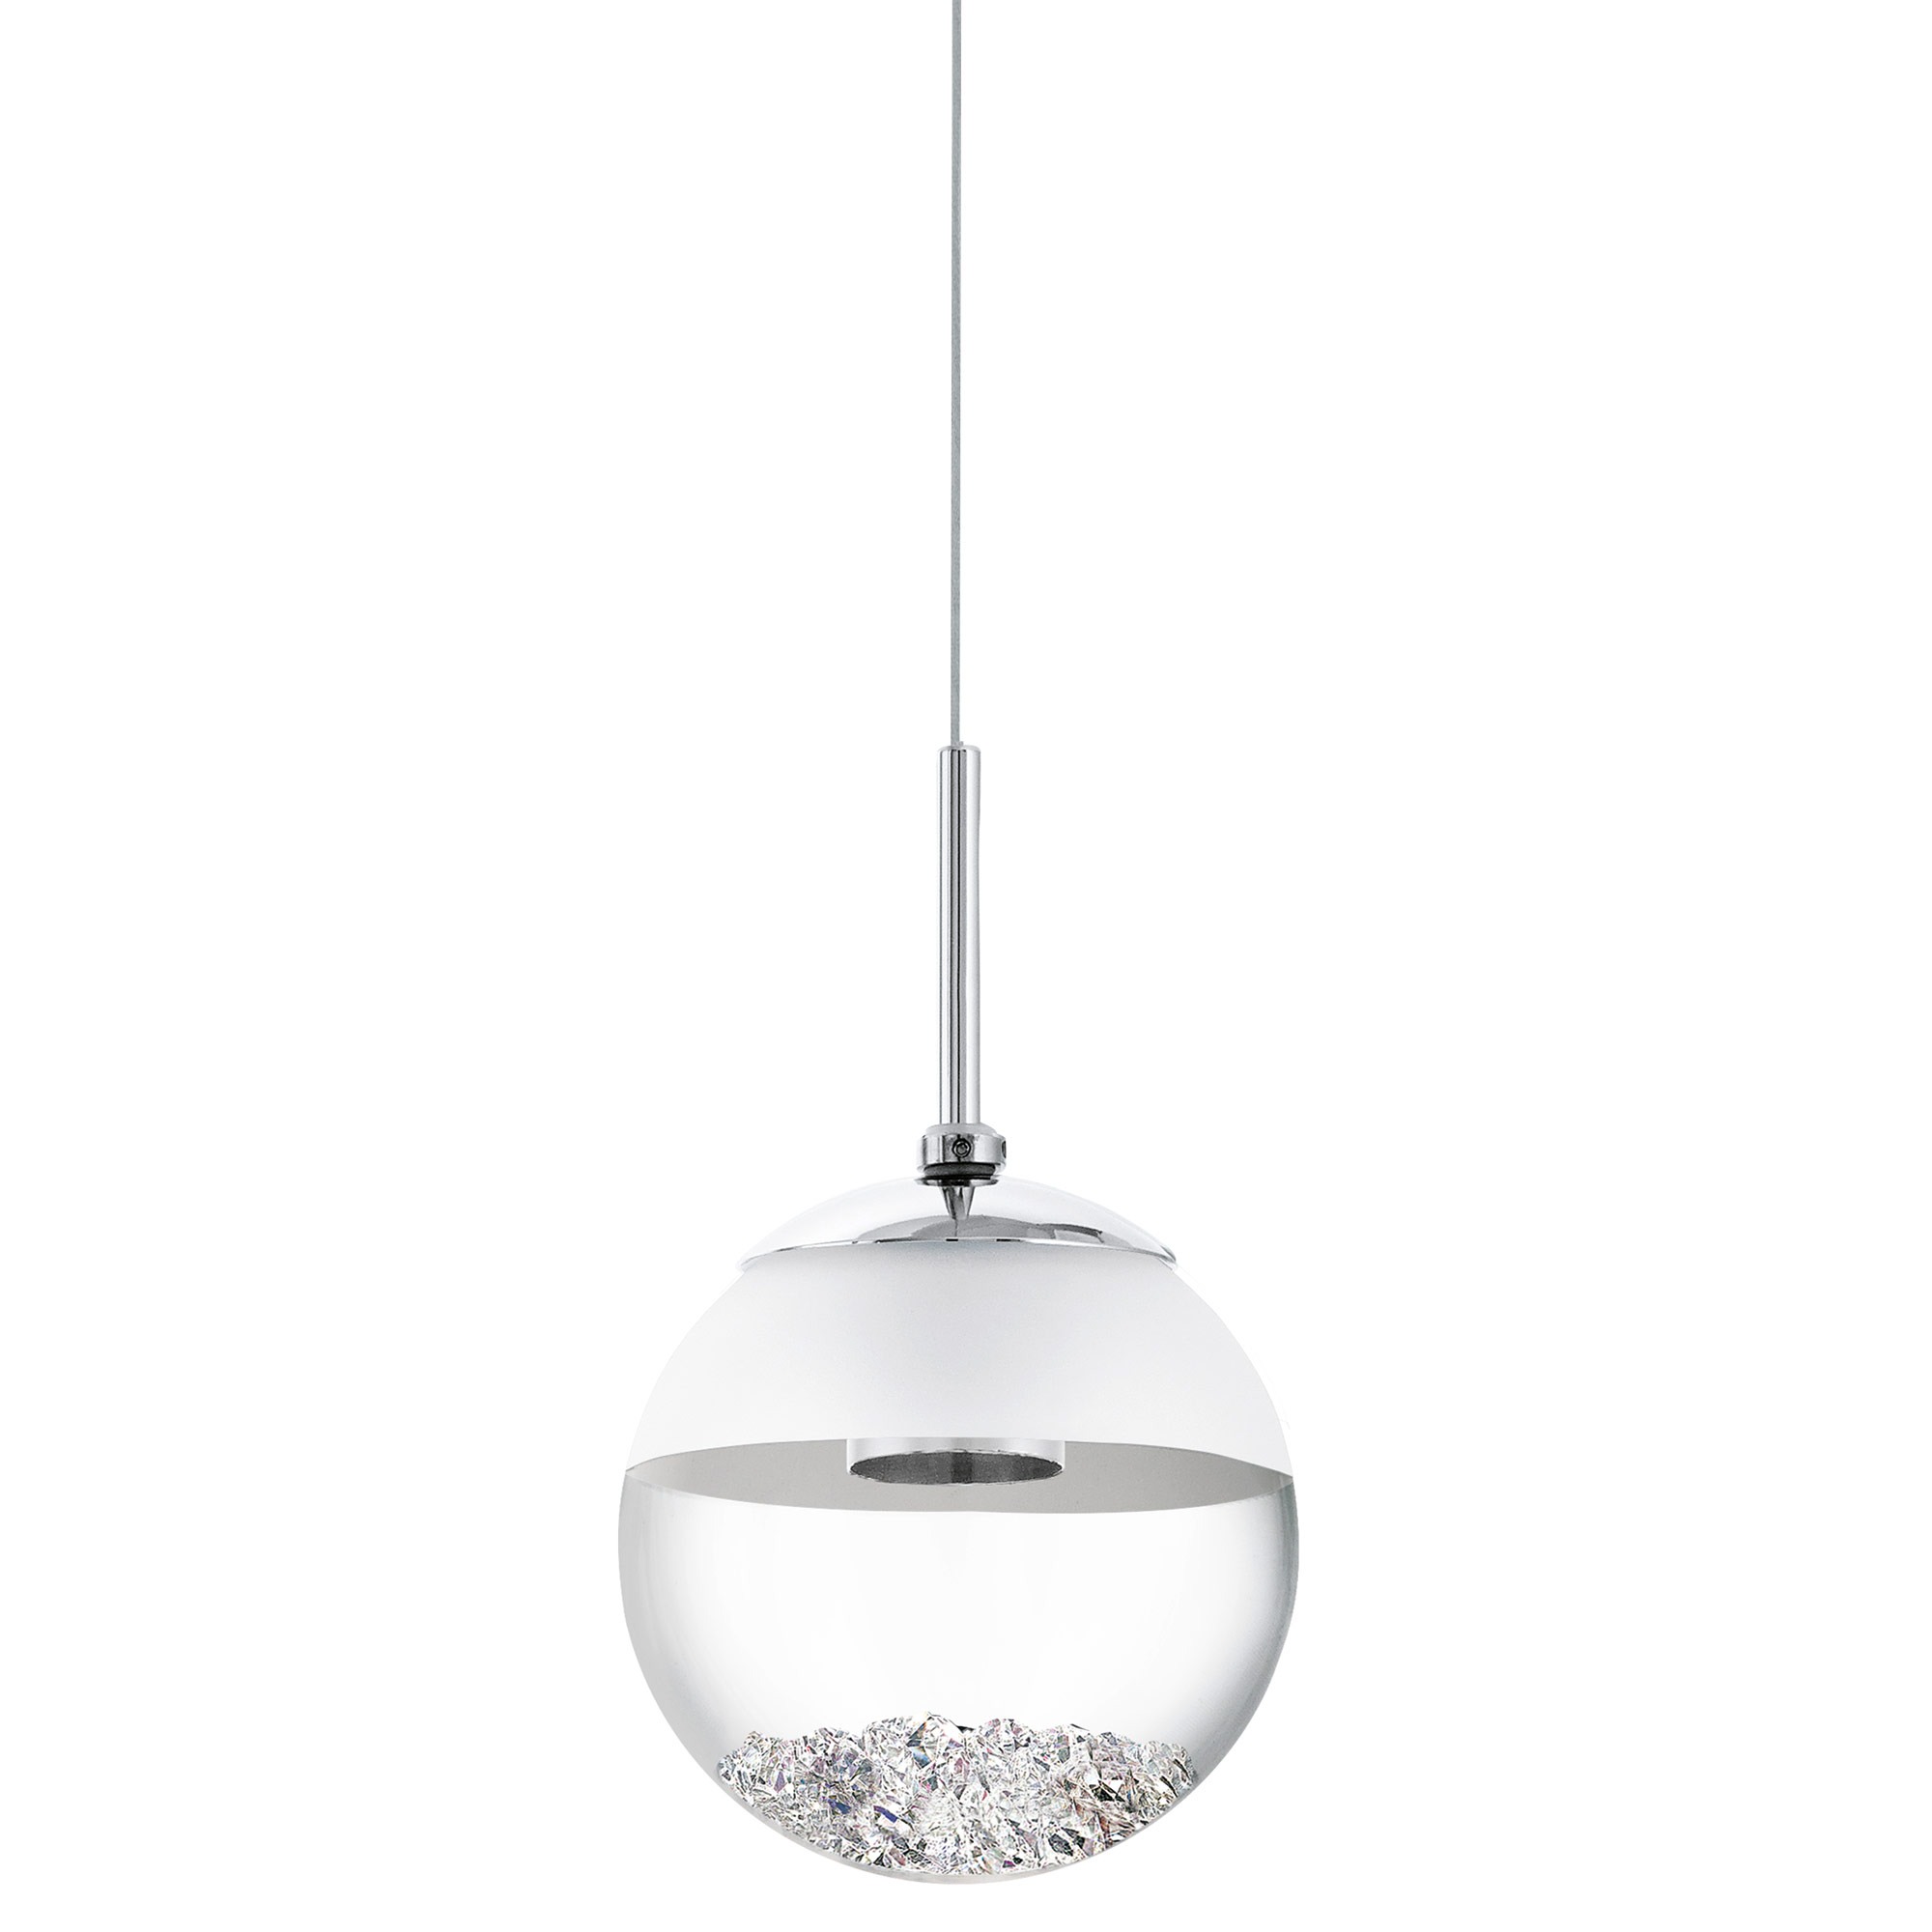 sale retailer 136c5 28f05 Montefio 1 Pendant by Eglo | 93708A